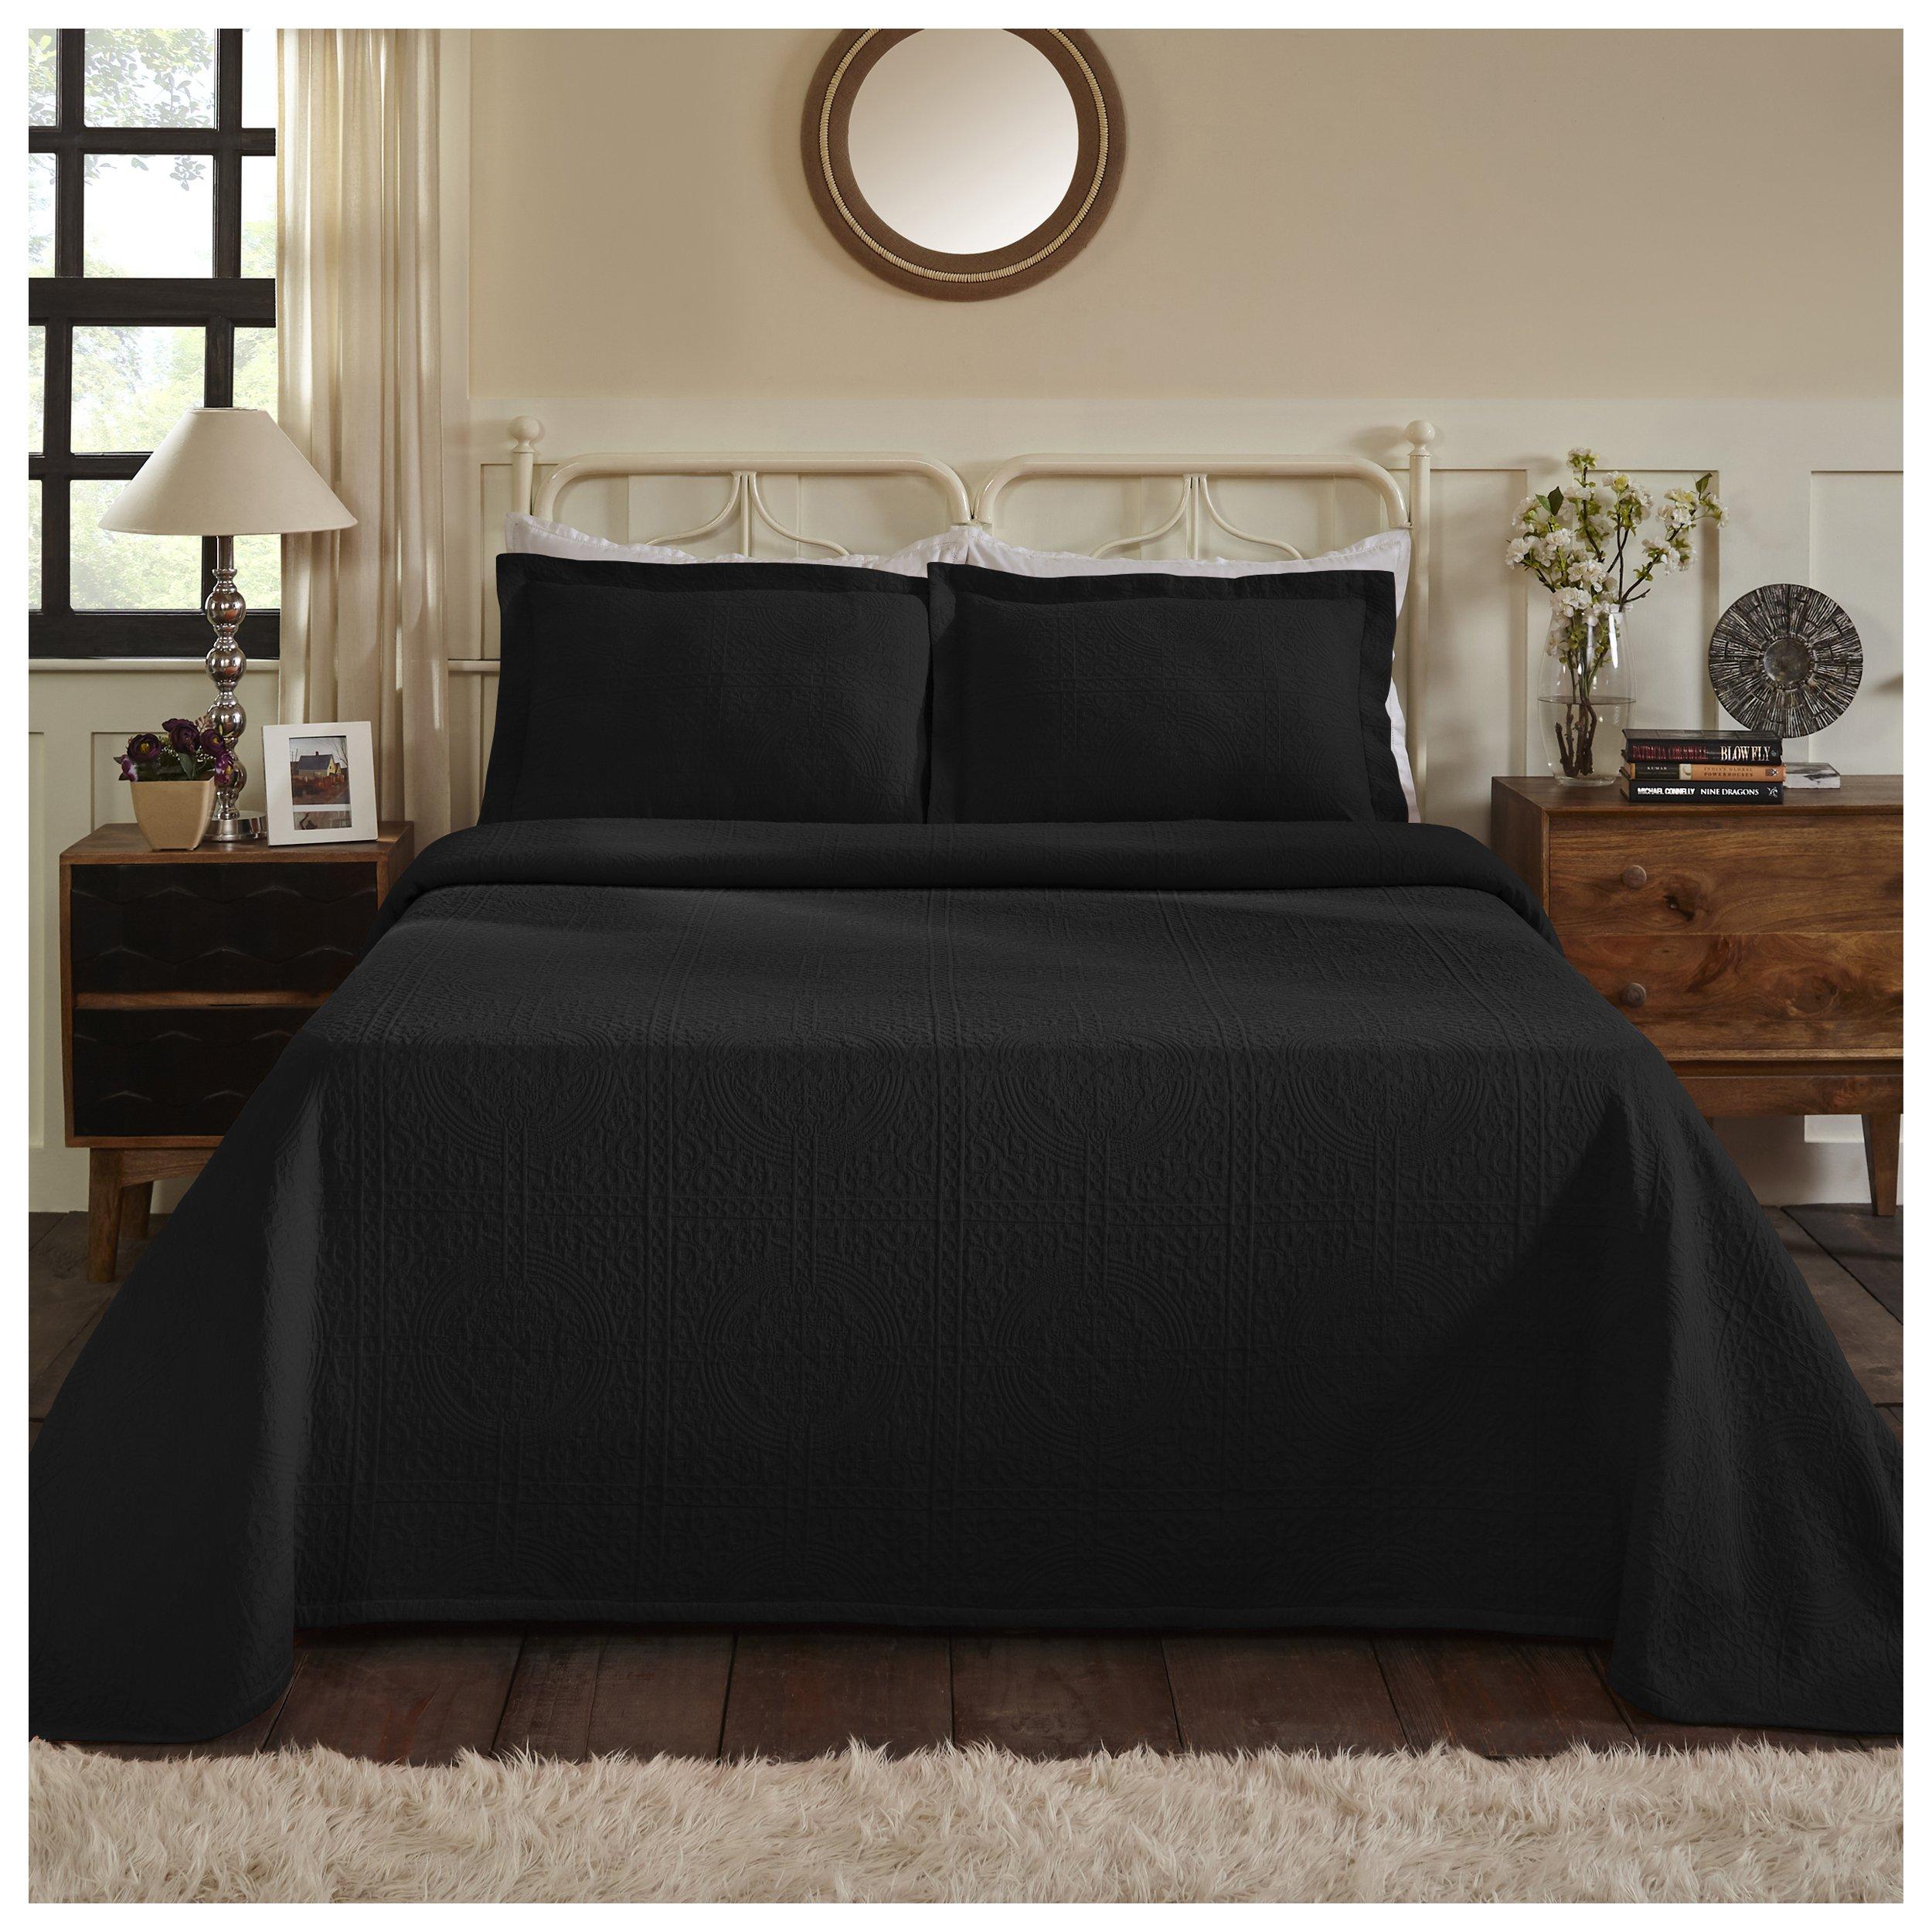 Superior 100% Cotton Medallion Bedspread with Shams, All-Season Premium Cotton Matelassé Jacquard Bedding, Quilted-look Floral Medallion Pattern - King, Black